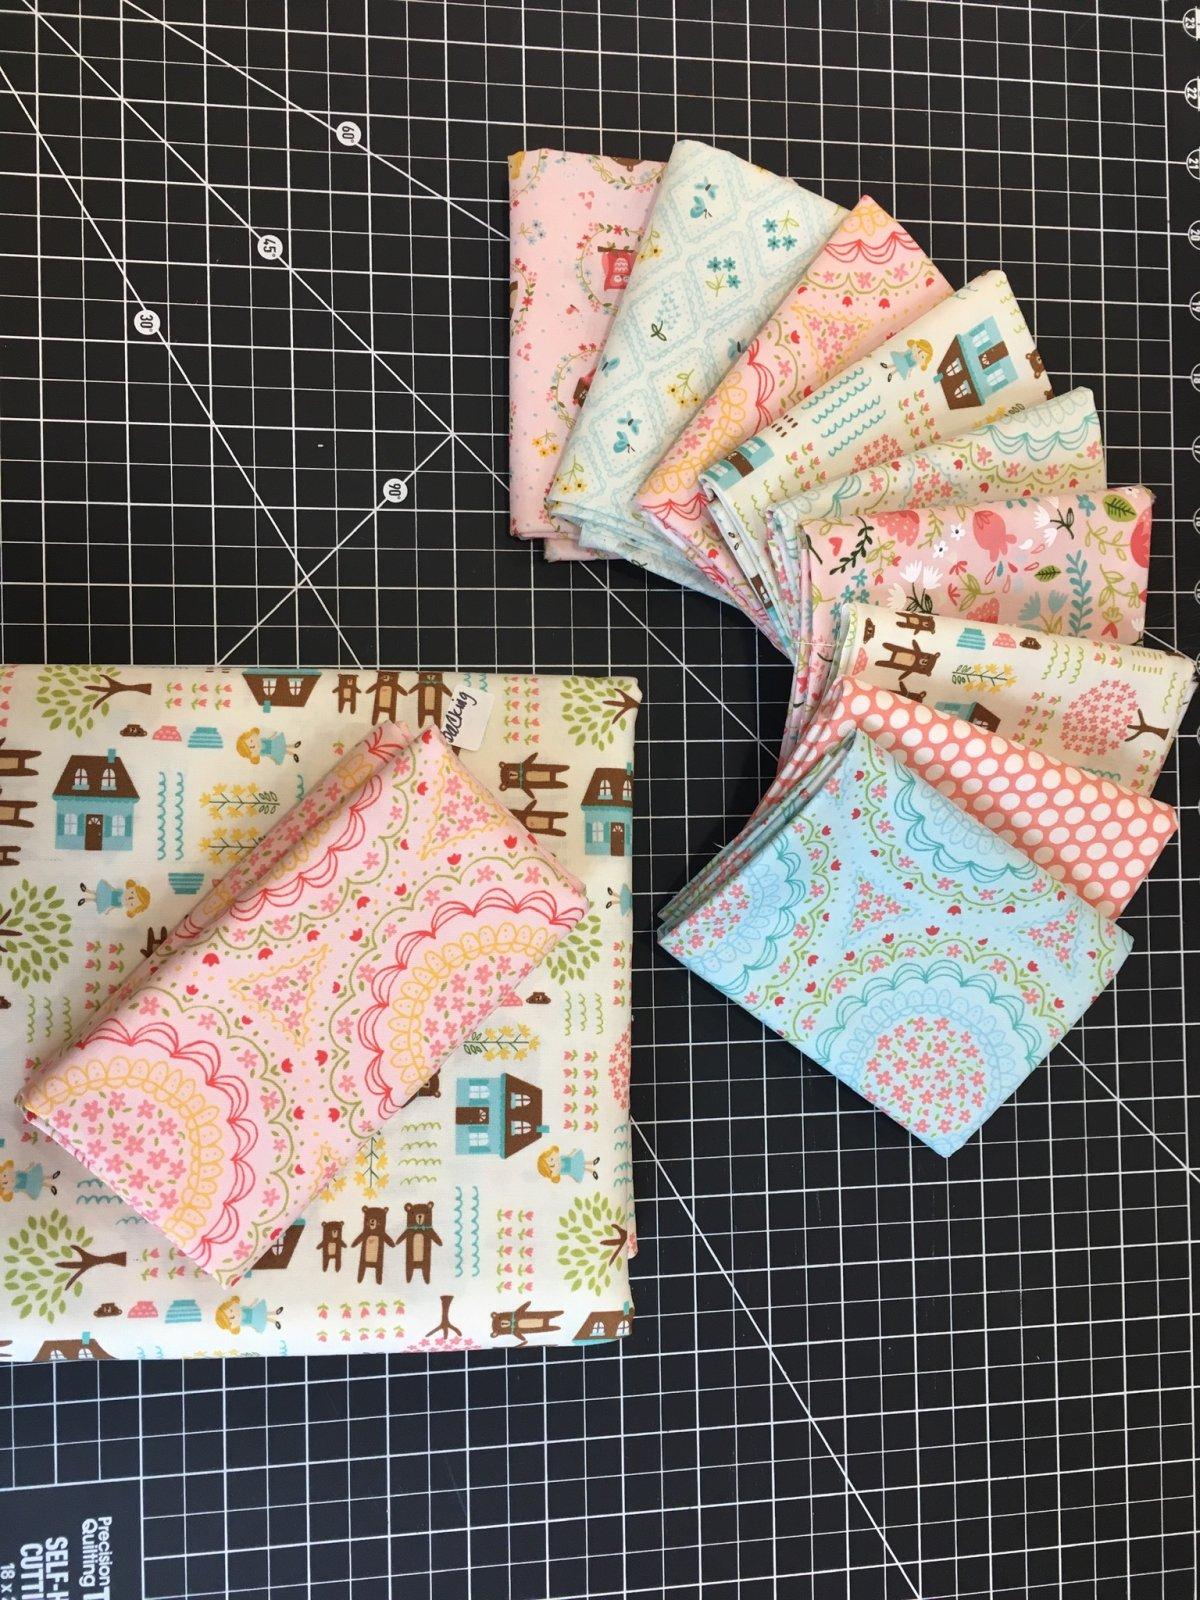 Kit - Simple Toddler - Pink/Blue/Off White - 428365